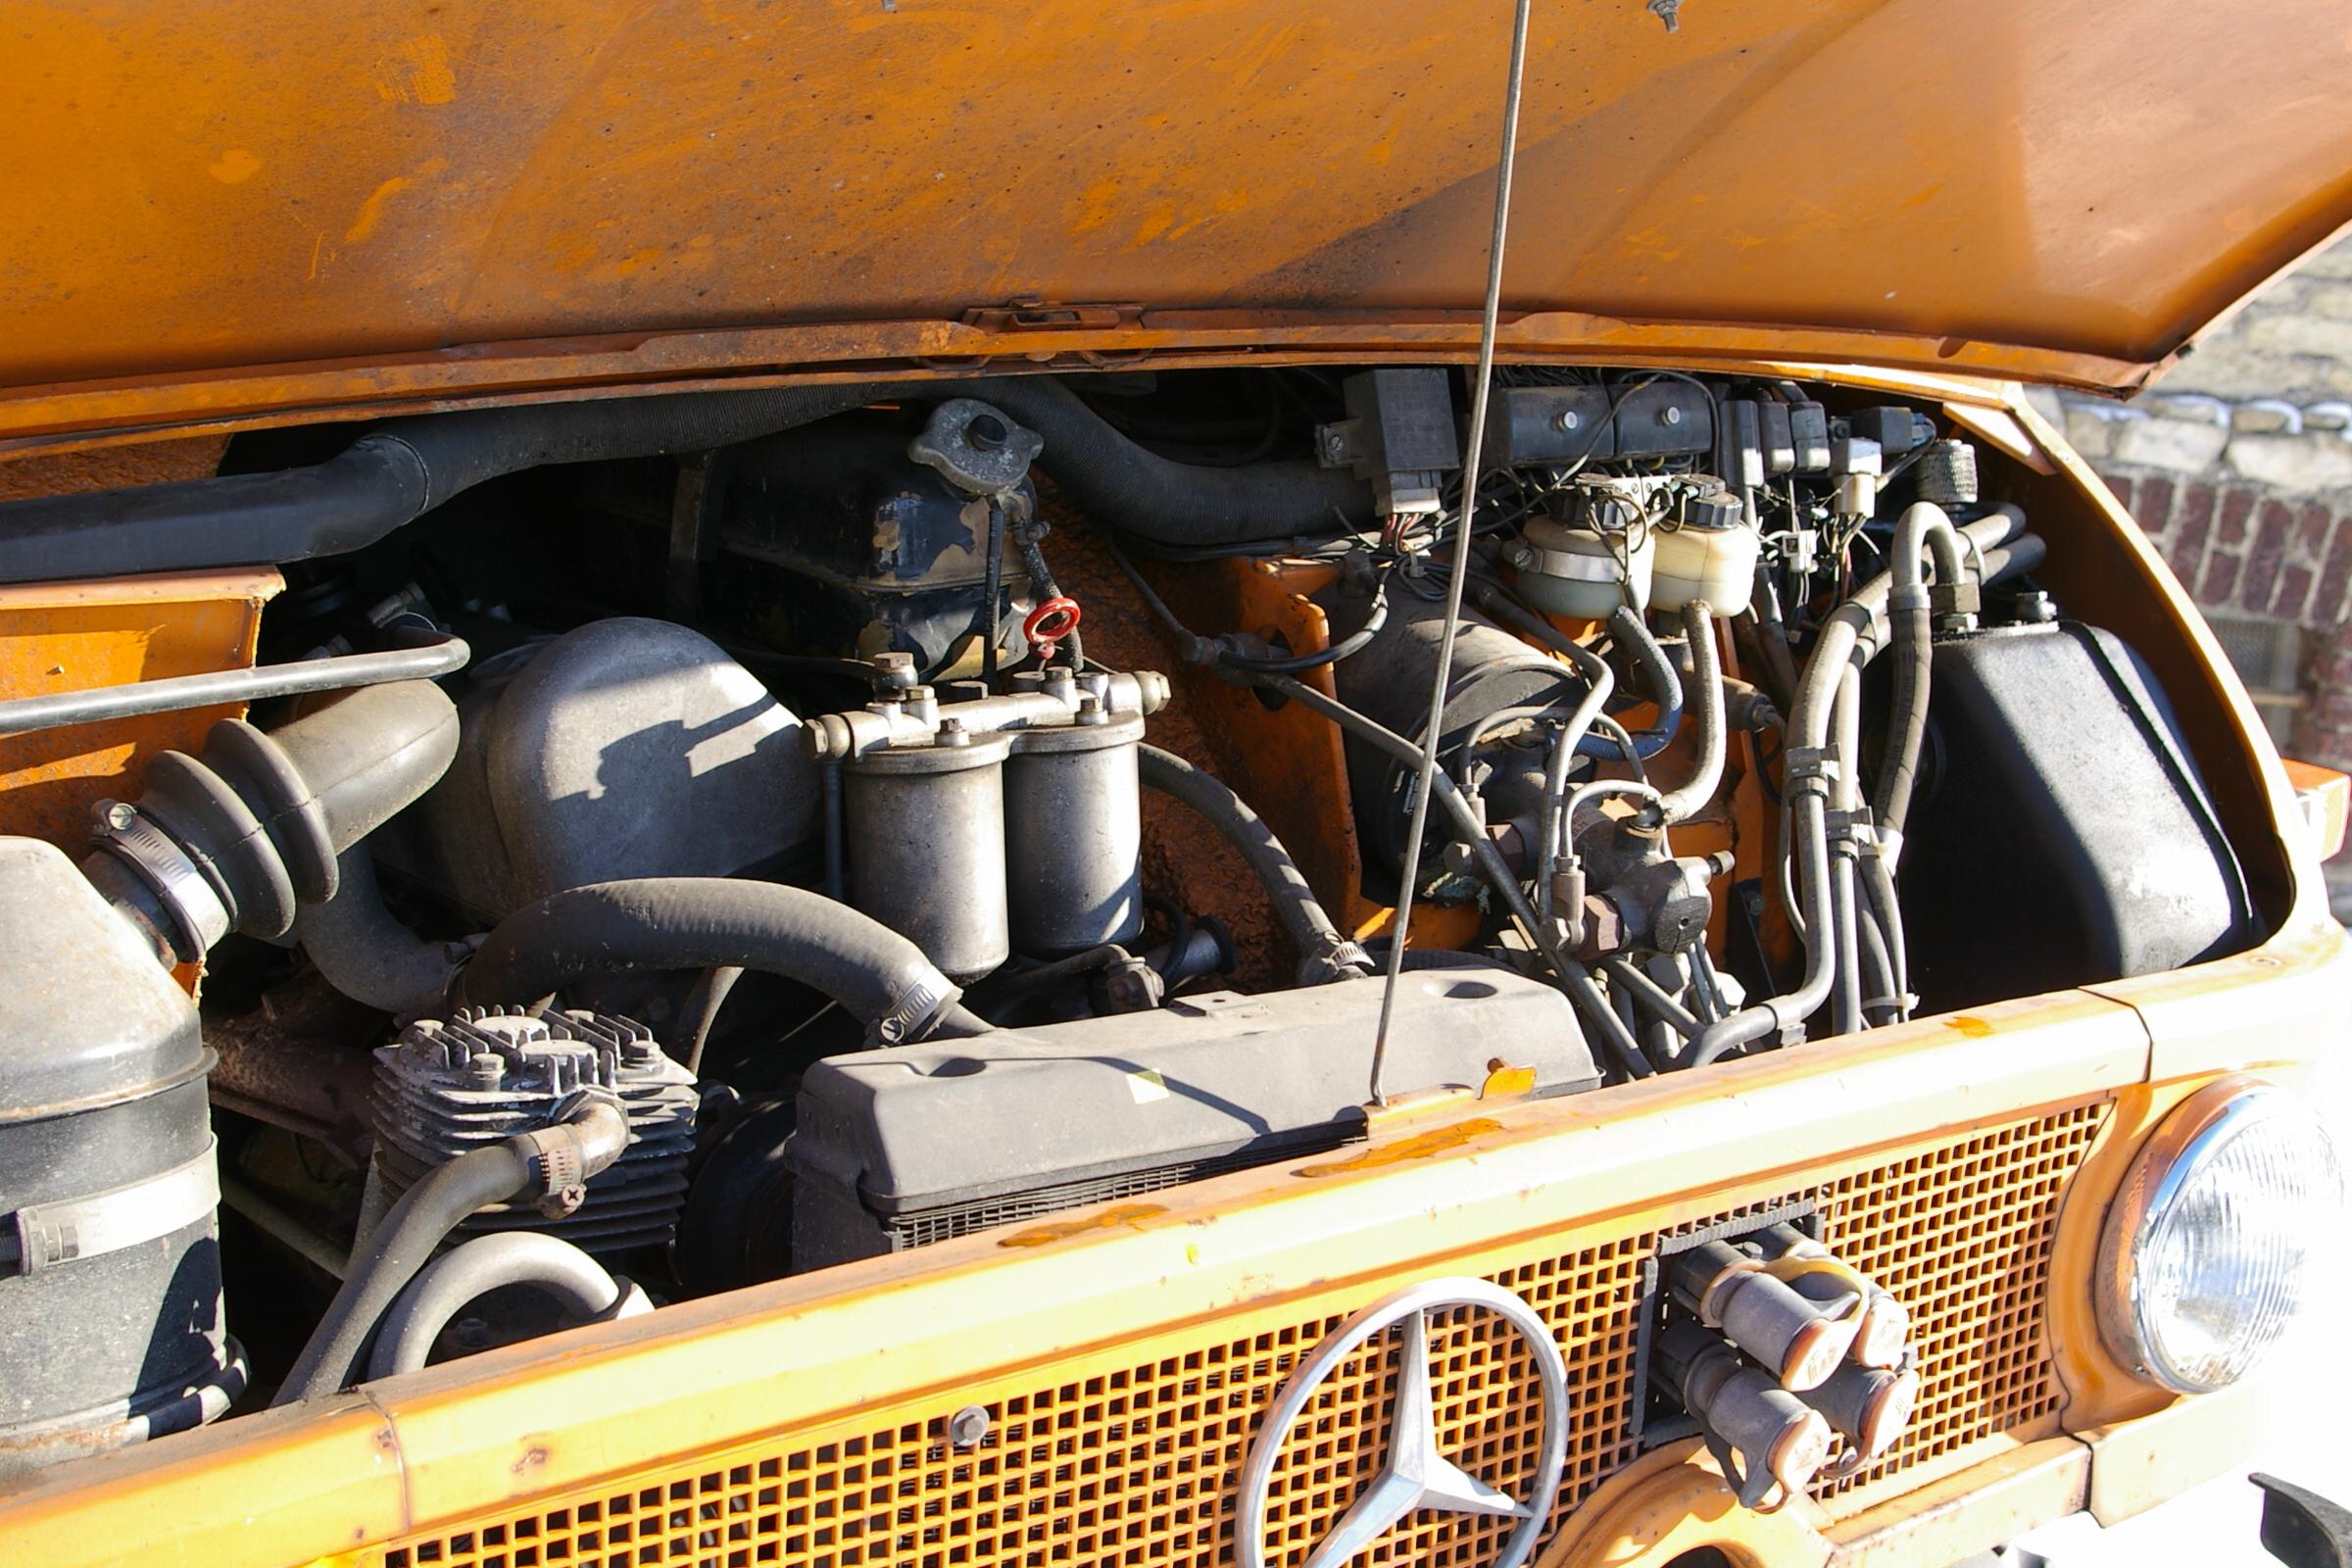 Mercedes-Benz OM616 engine - Wikipedia